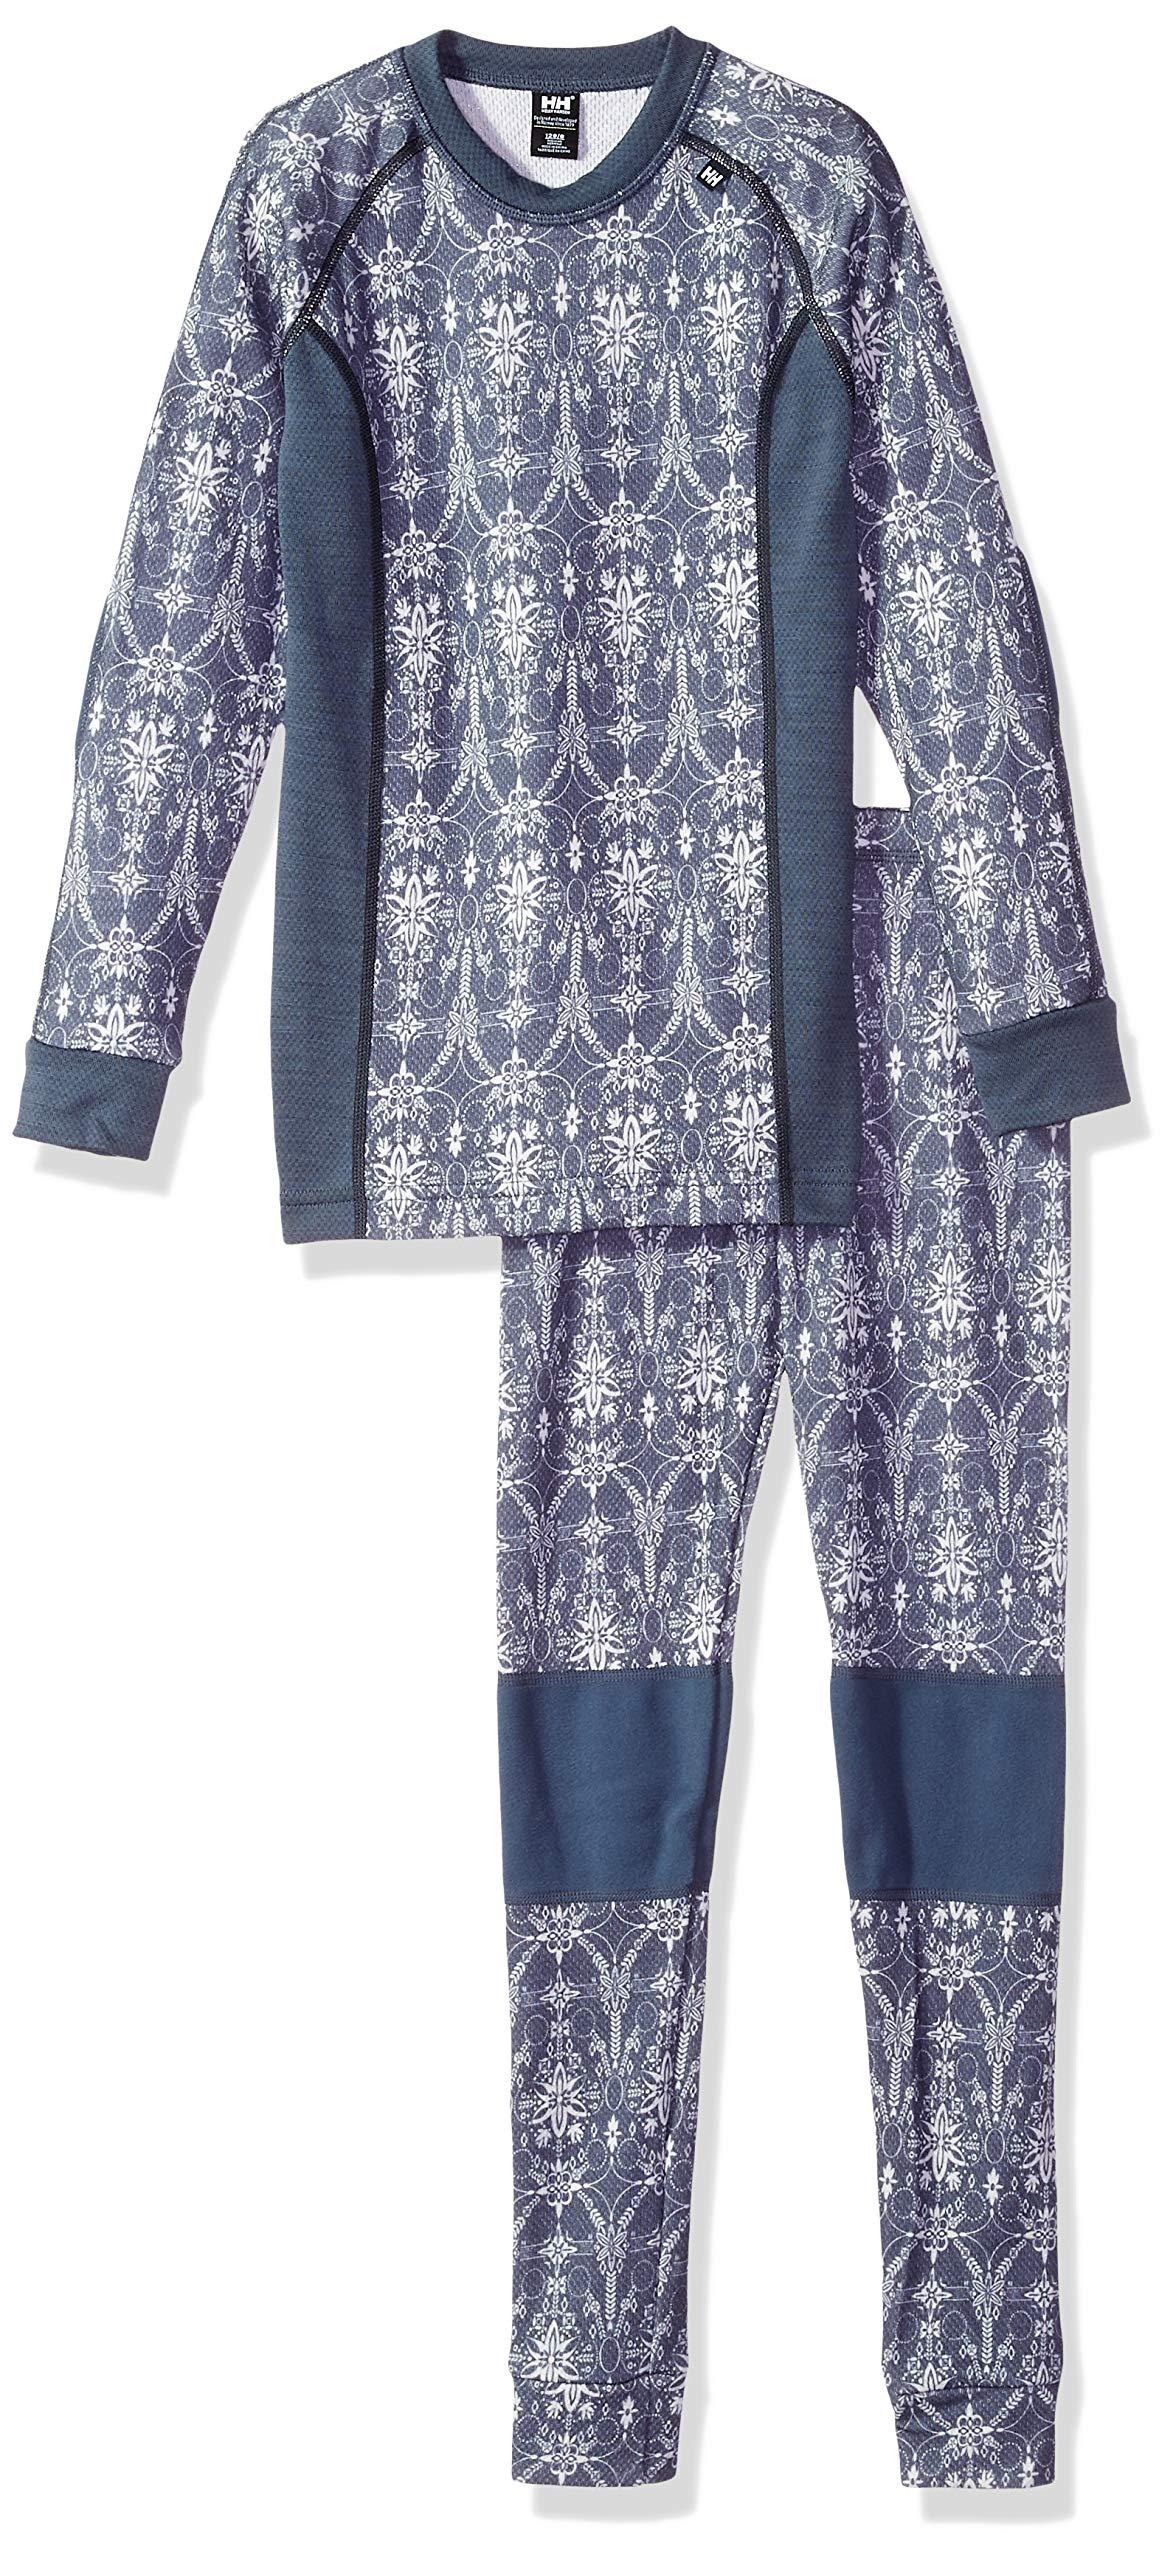 Helly Hansen Jr LIFA Merino Set 2 Wool Baselayer, Vintage Indigo/Frost, Size 16